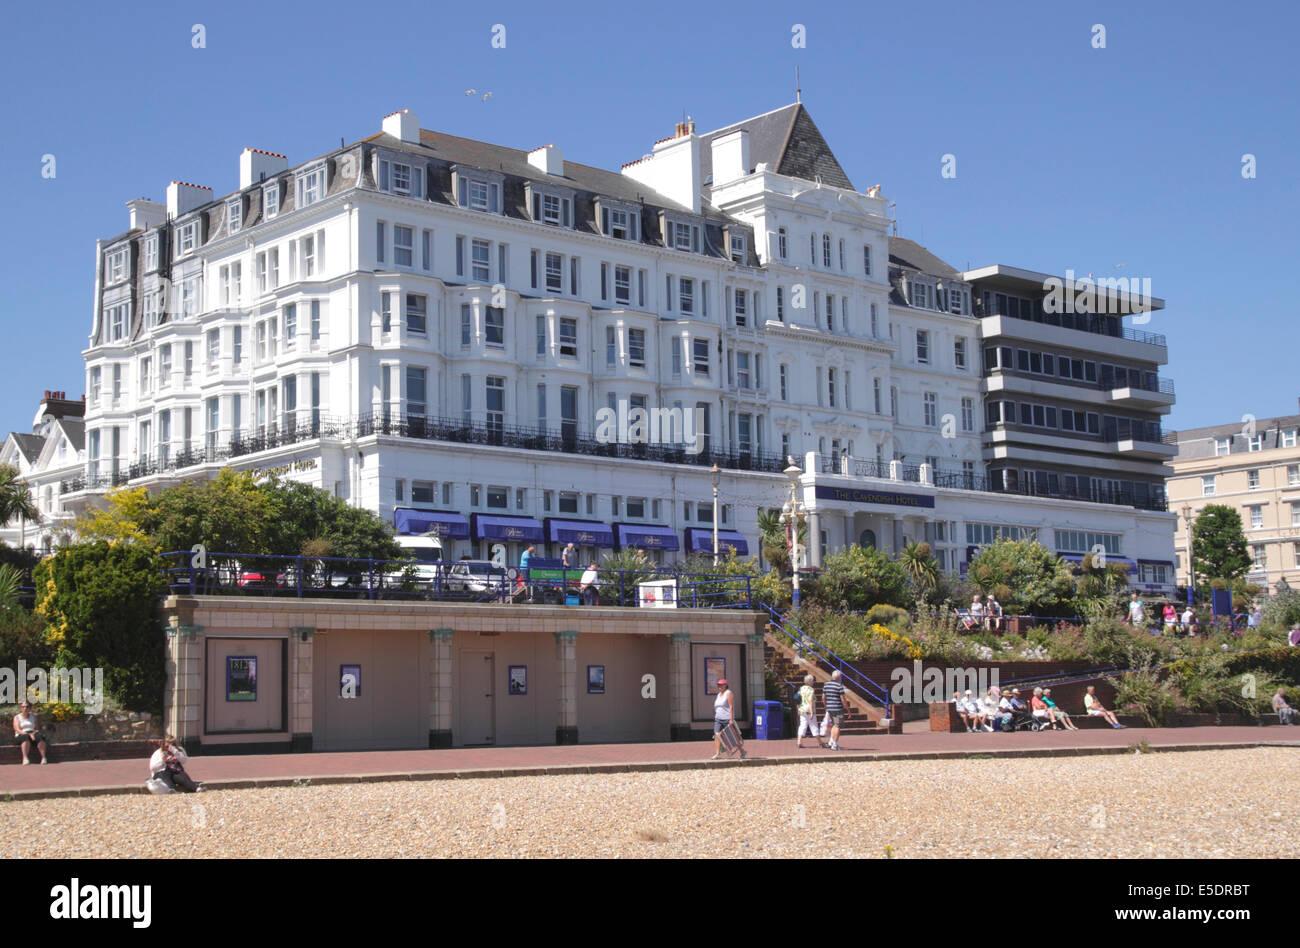 The Cavendish Hotel Grand Parade Eastbourne Stock Photo. The Westin San Francisco Airport Hotel. Edgewater Hotel. Best Western Europe Hotel. Best Western Cannes Riviera. Radisson Blu Edwardian Manchester Hotel. Hotel Gio. Zhejiang International Hotel. Y Resort Jeju